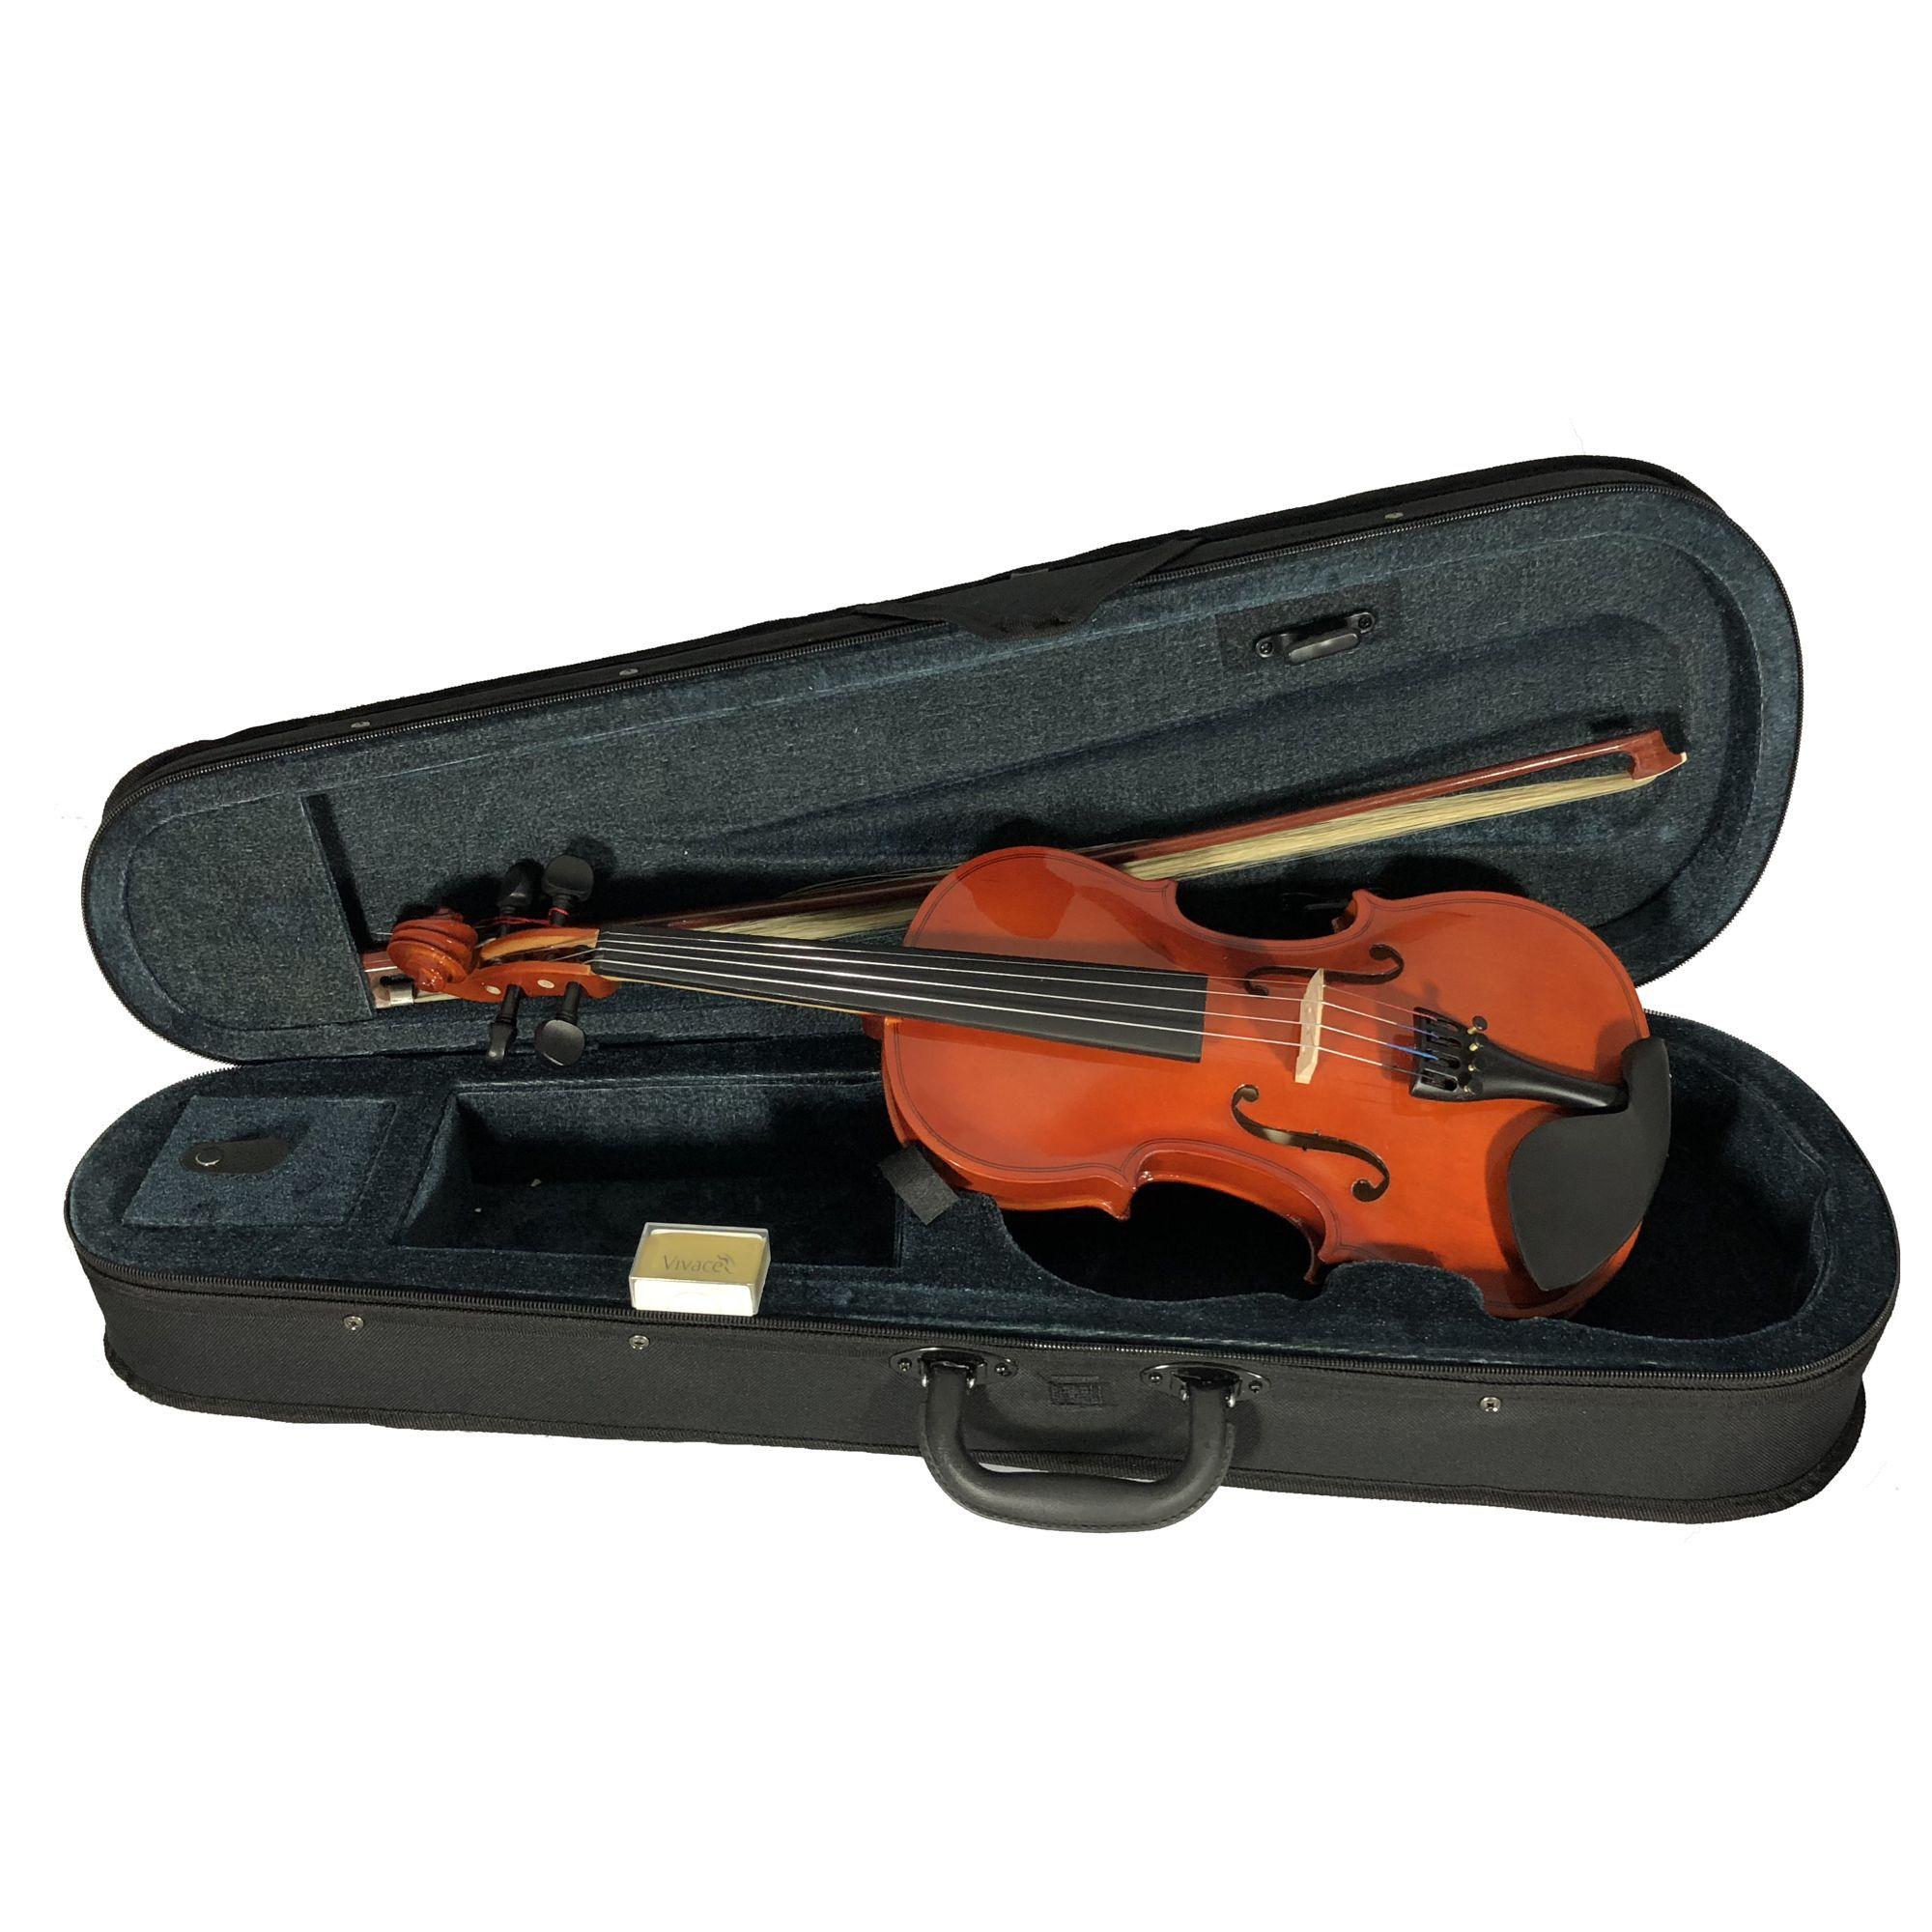 Violino Vivace Mozart 3/4 Verniz Mo34  - MegaLojaSP